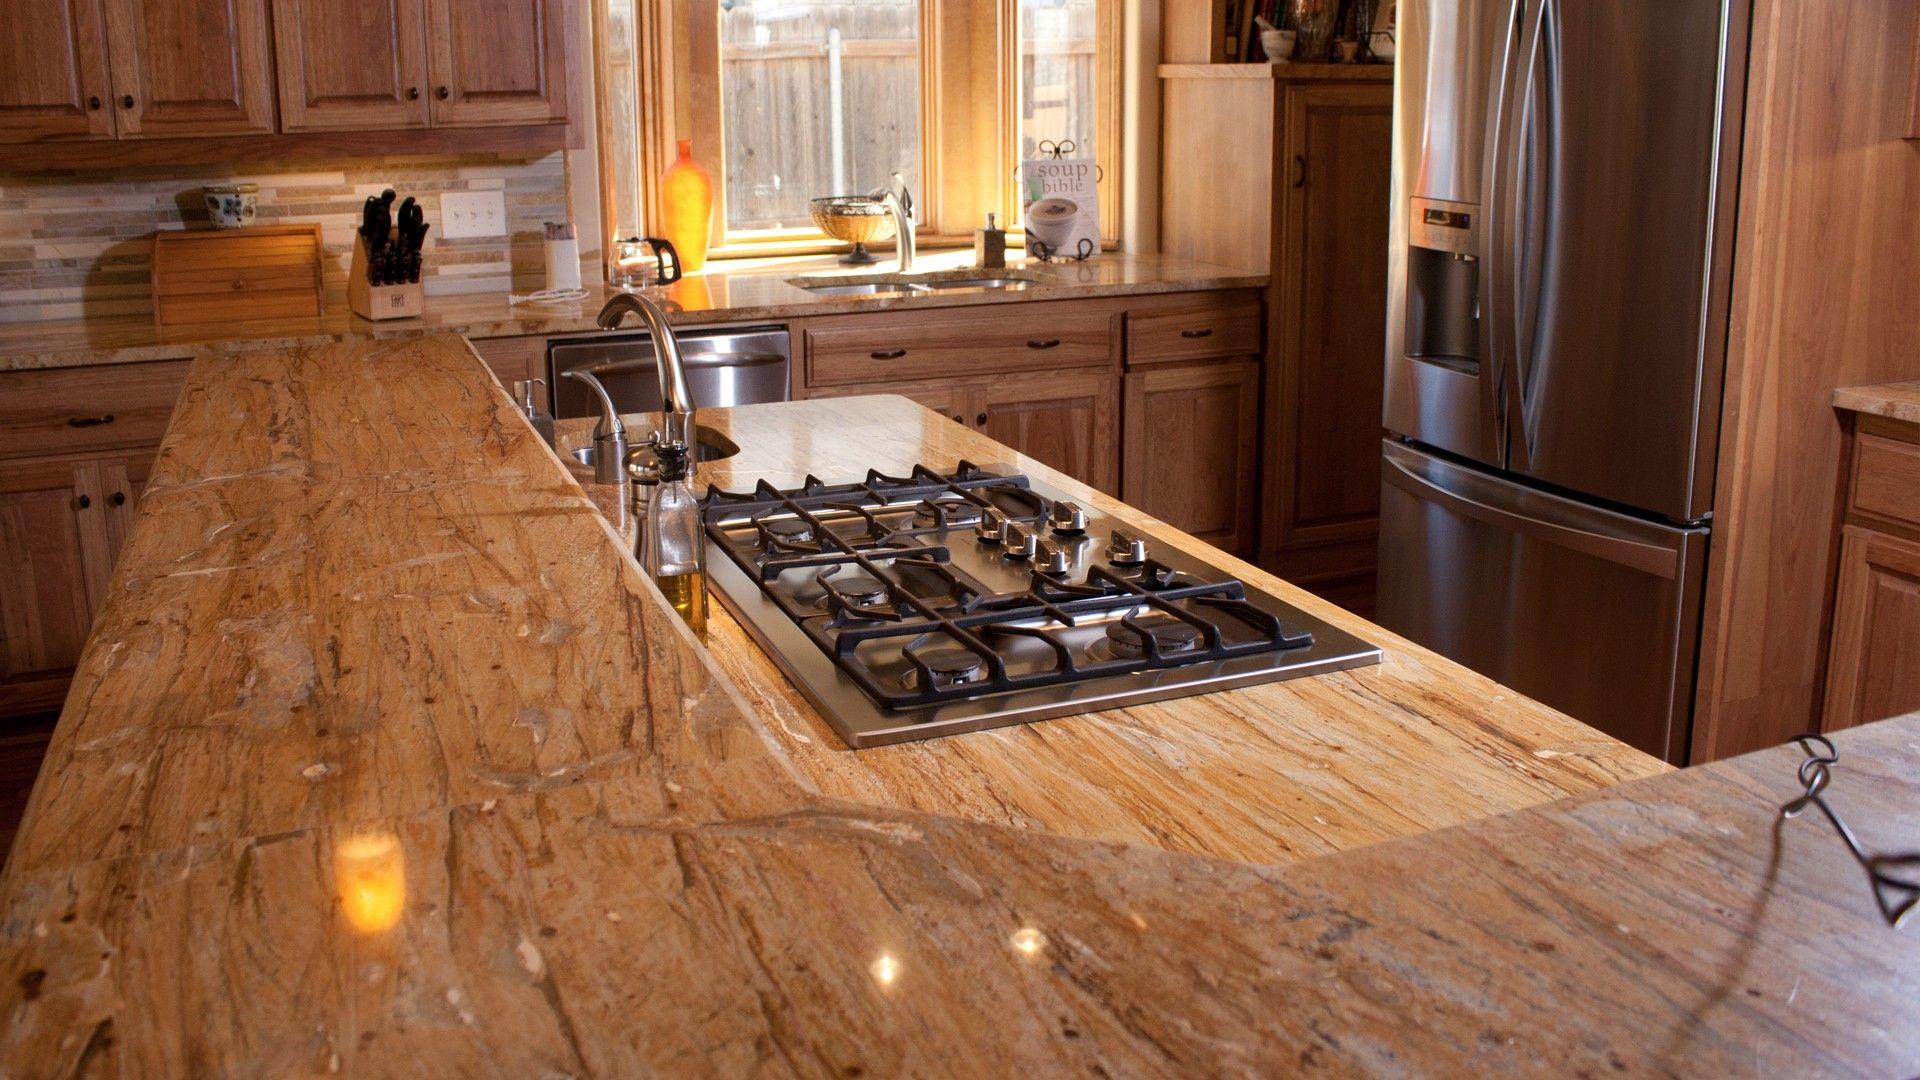 J B Countertops San Antonio Seven Great J B Countertops San Antonio Ideas That You Can S Home Office Furniture Affordable Furniture Quartz Kitchen Countertops